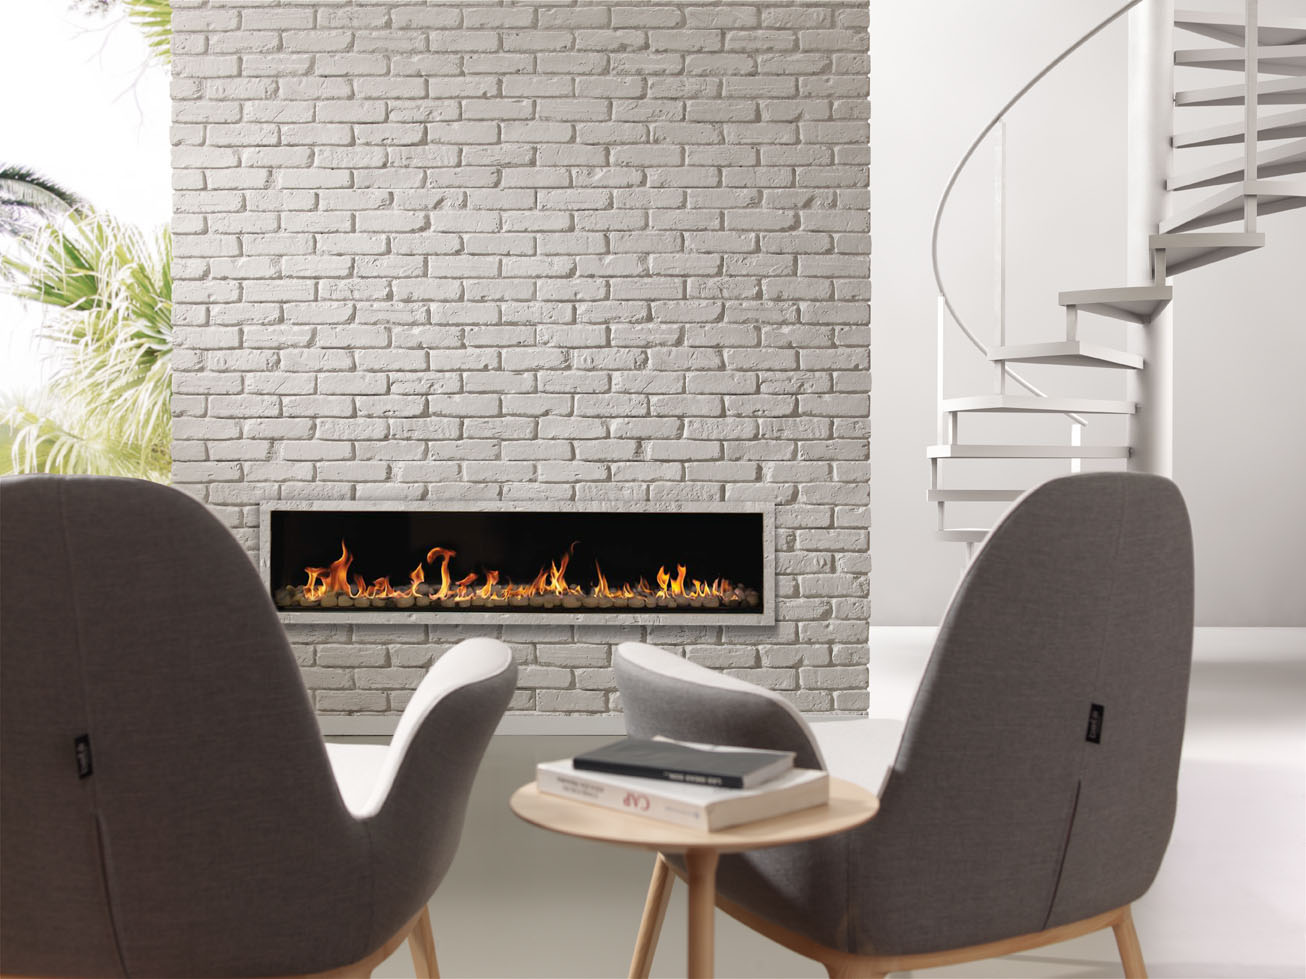 British brick ladrillo ingles - Ladrillo caravista blanco ...